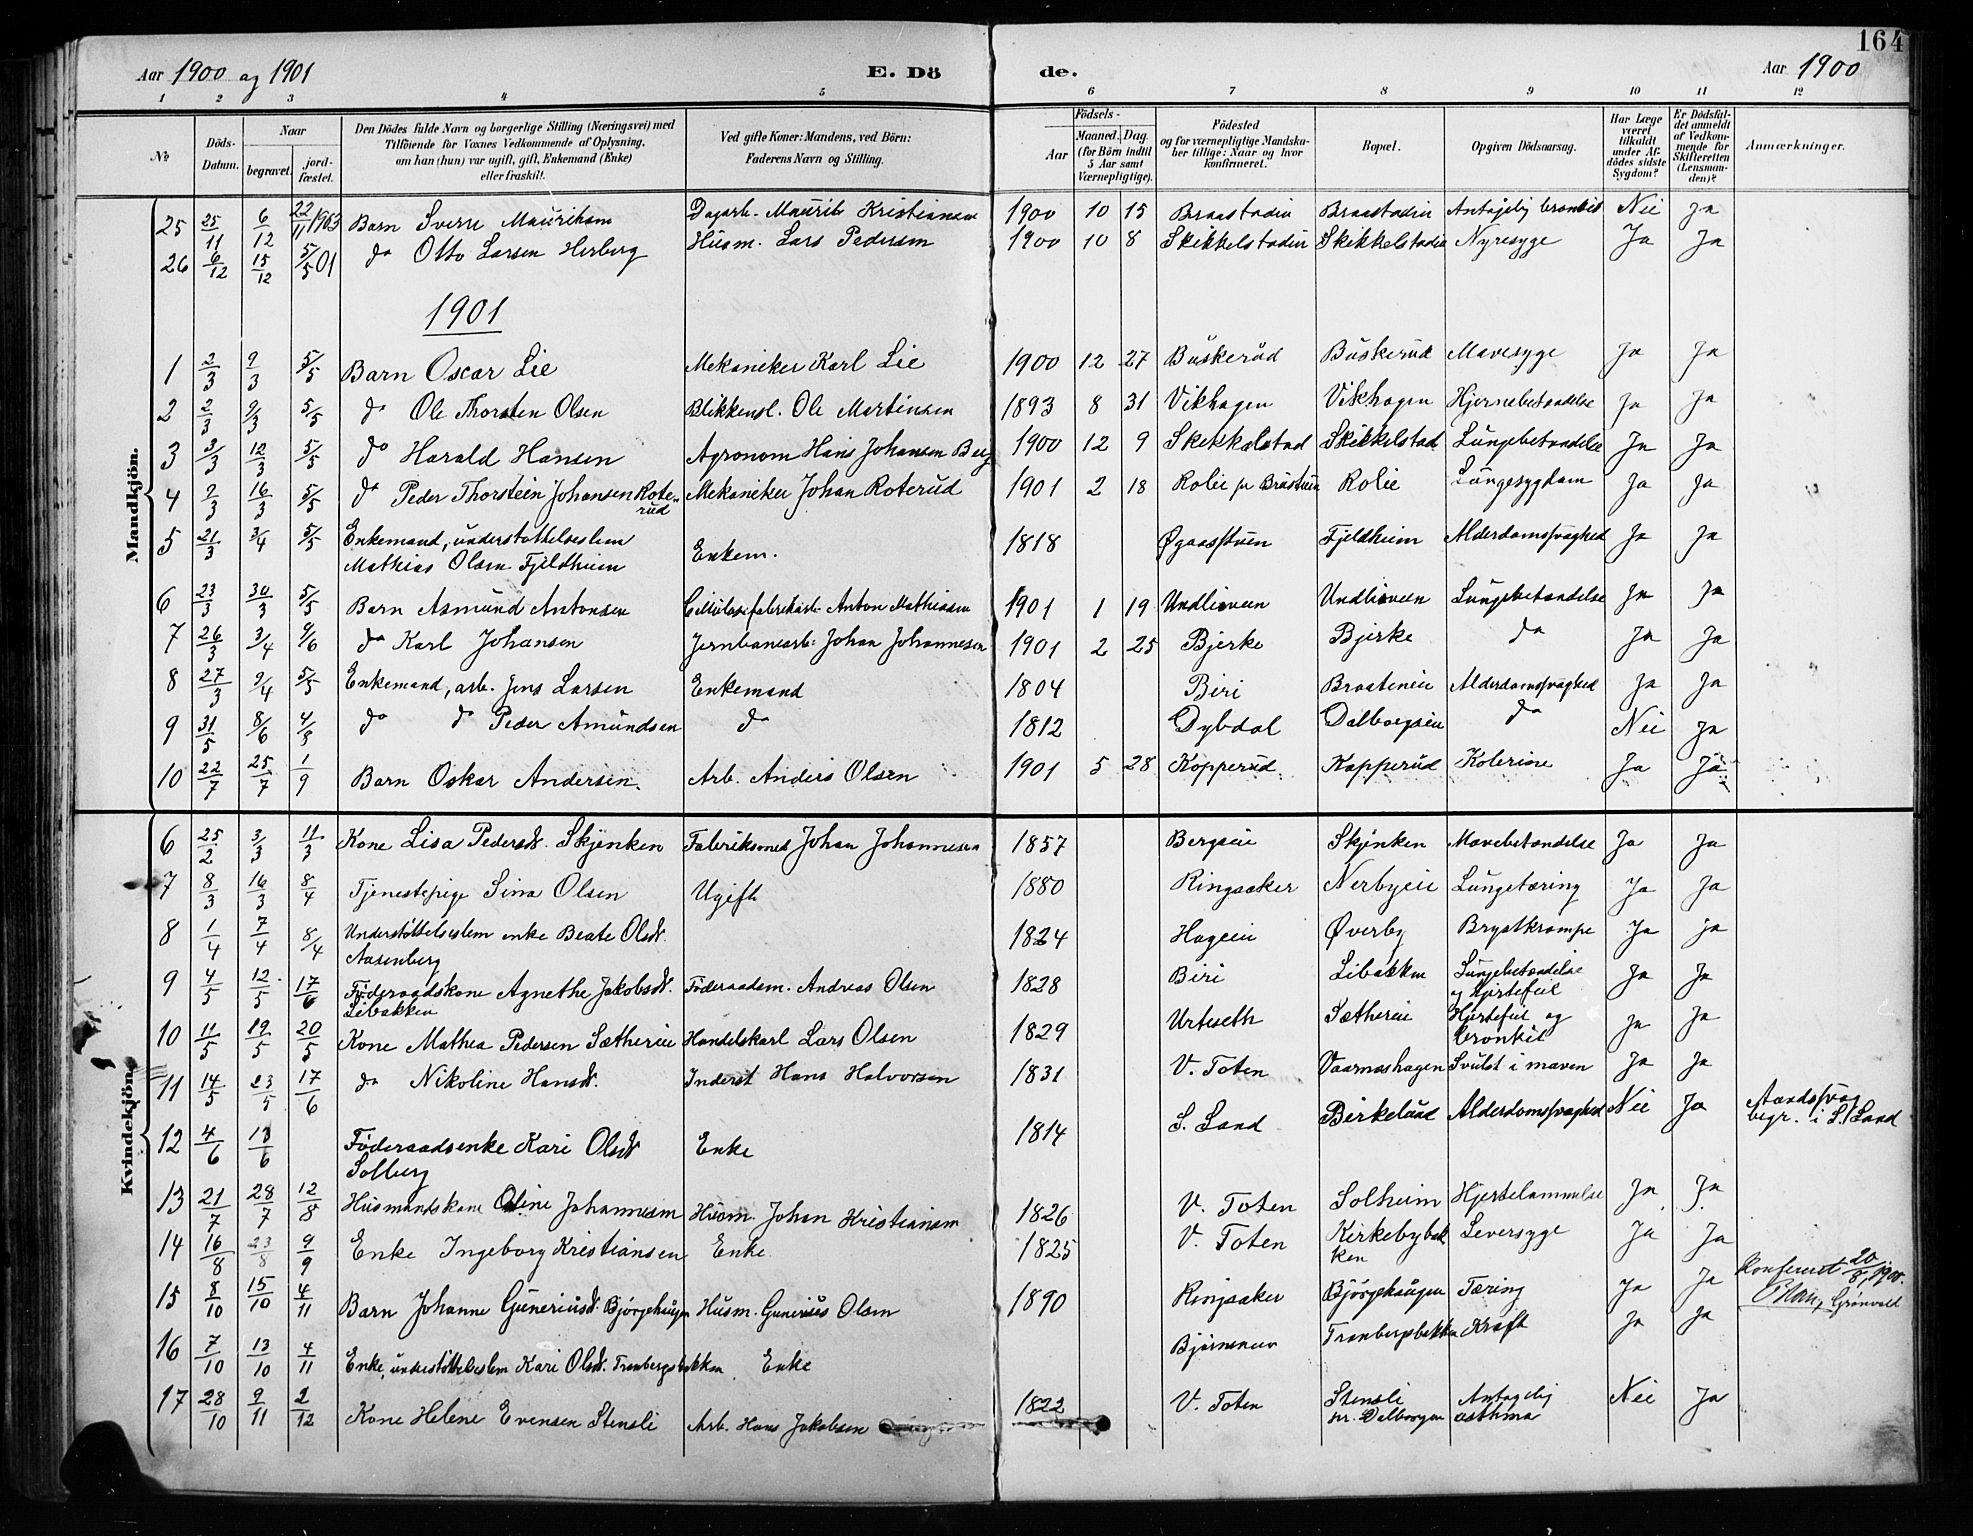 SAH, Vardal prestekontor, H/Ha/Hab/L0010: Klokkerbok nr. 10, 1895-1903, s. 164